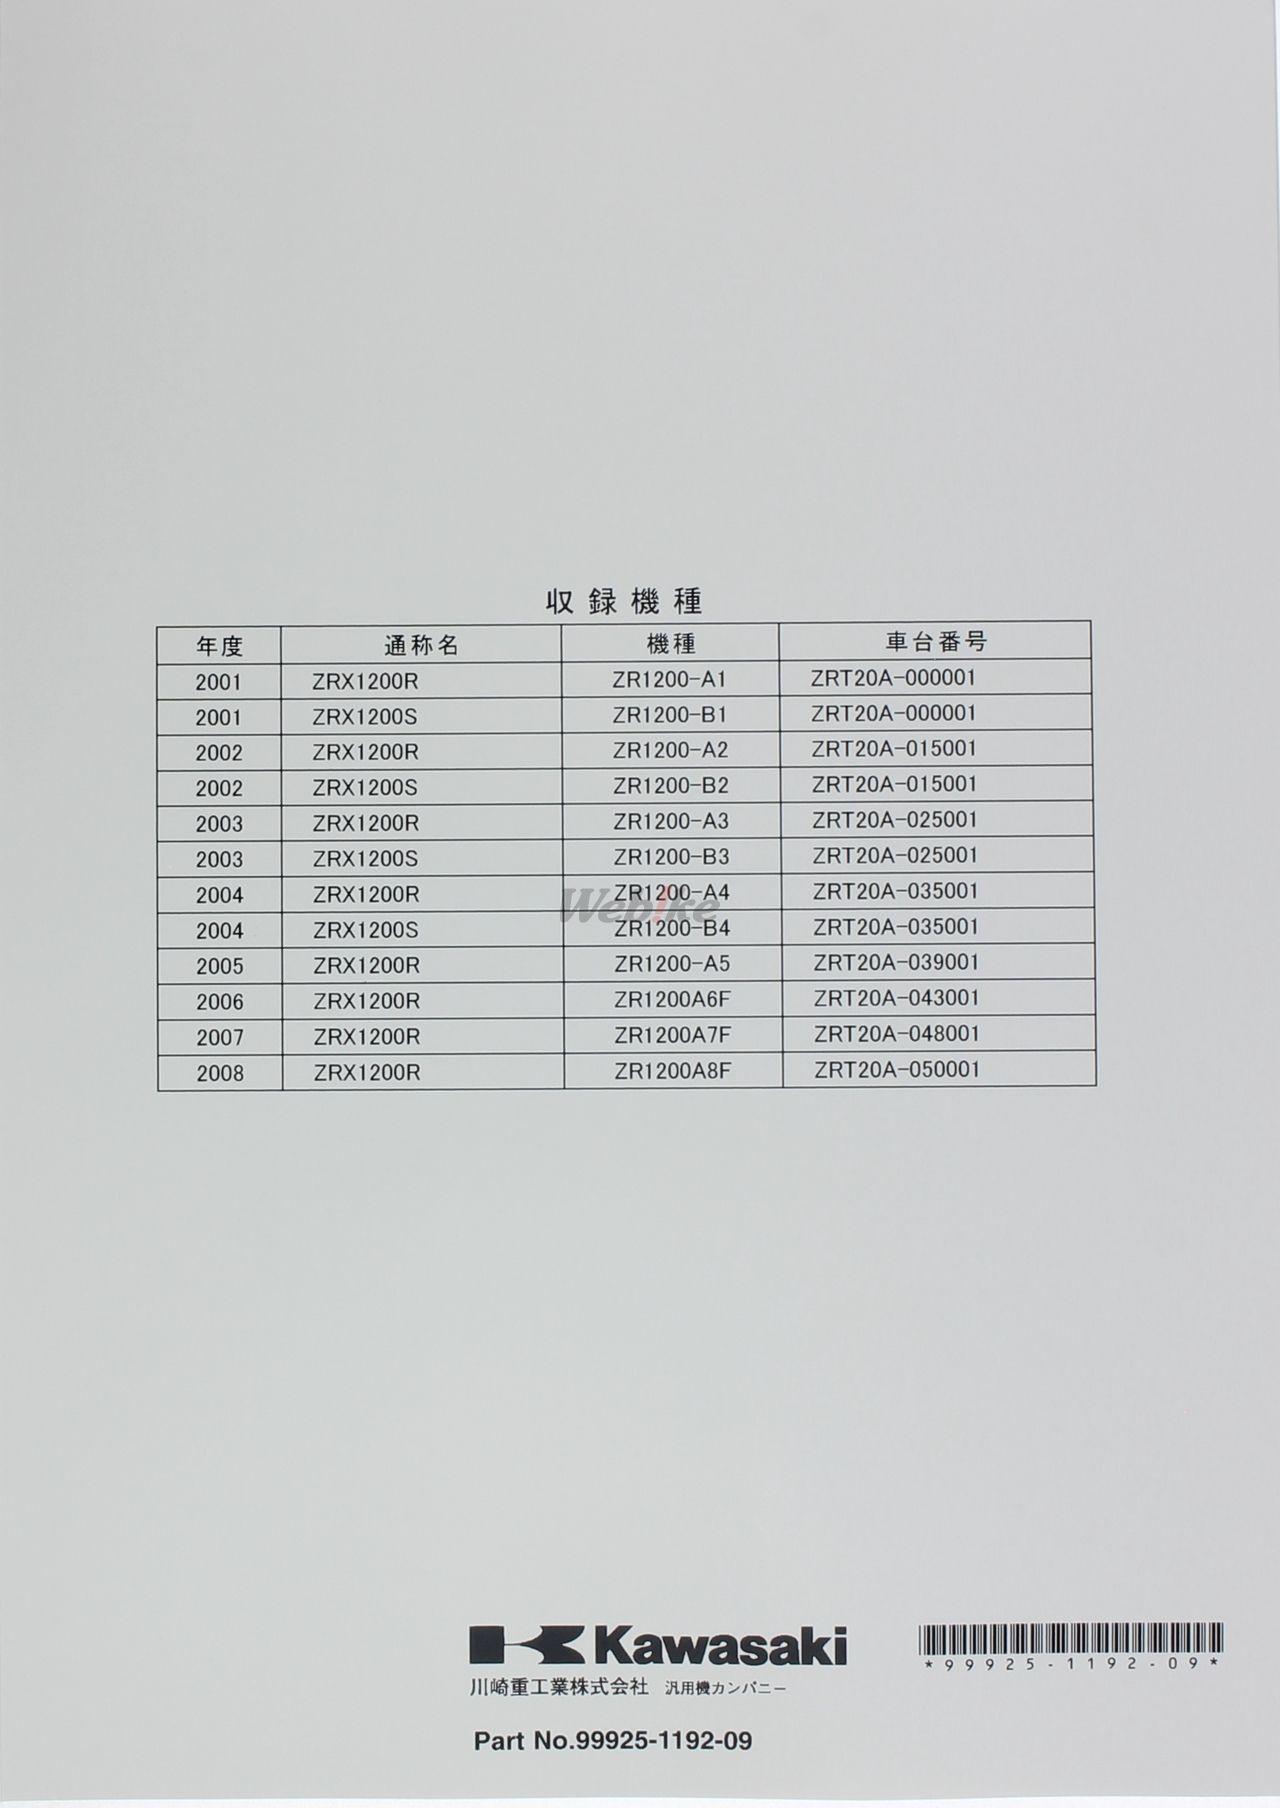 【KAWASAKI】ZRX1200/ZRX 1200S 維修手冊(基本版) - 「Webike-摩托百貨」